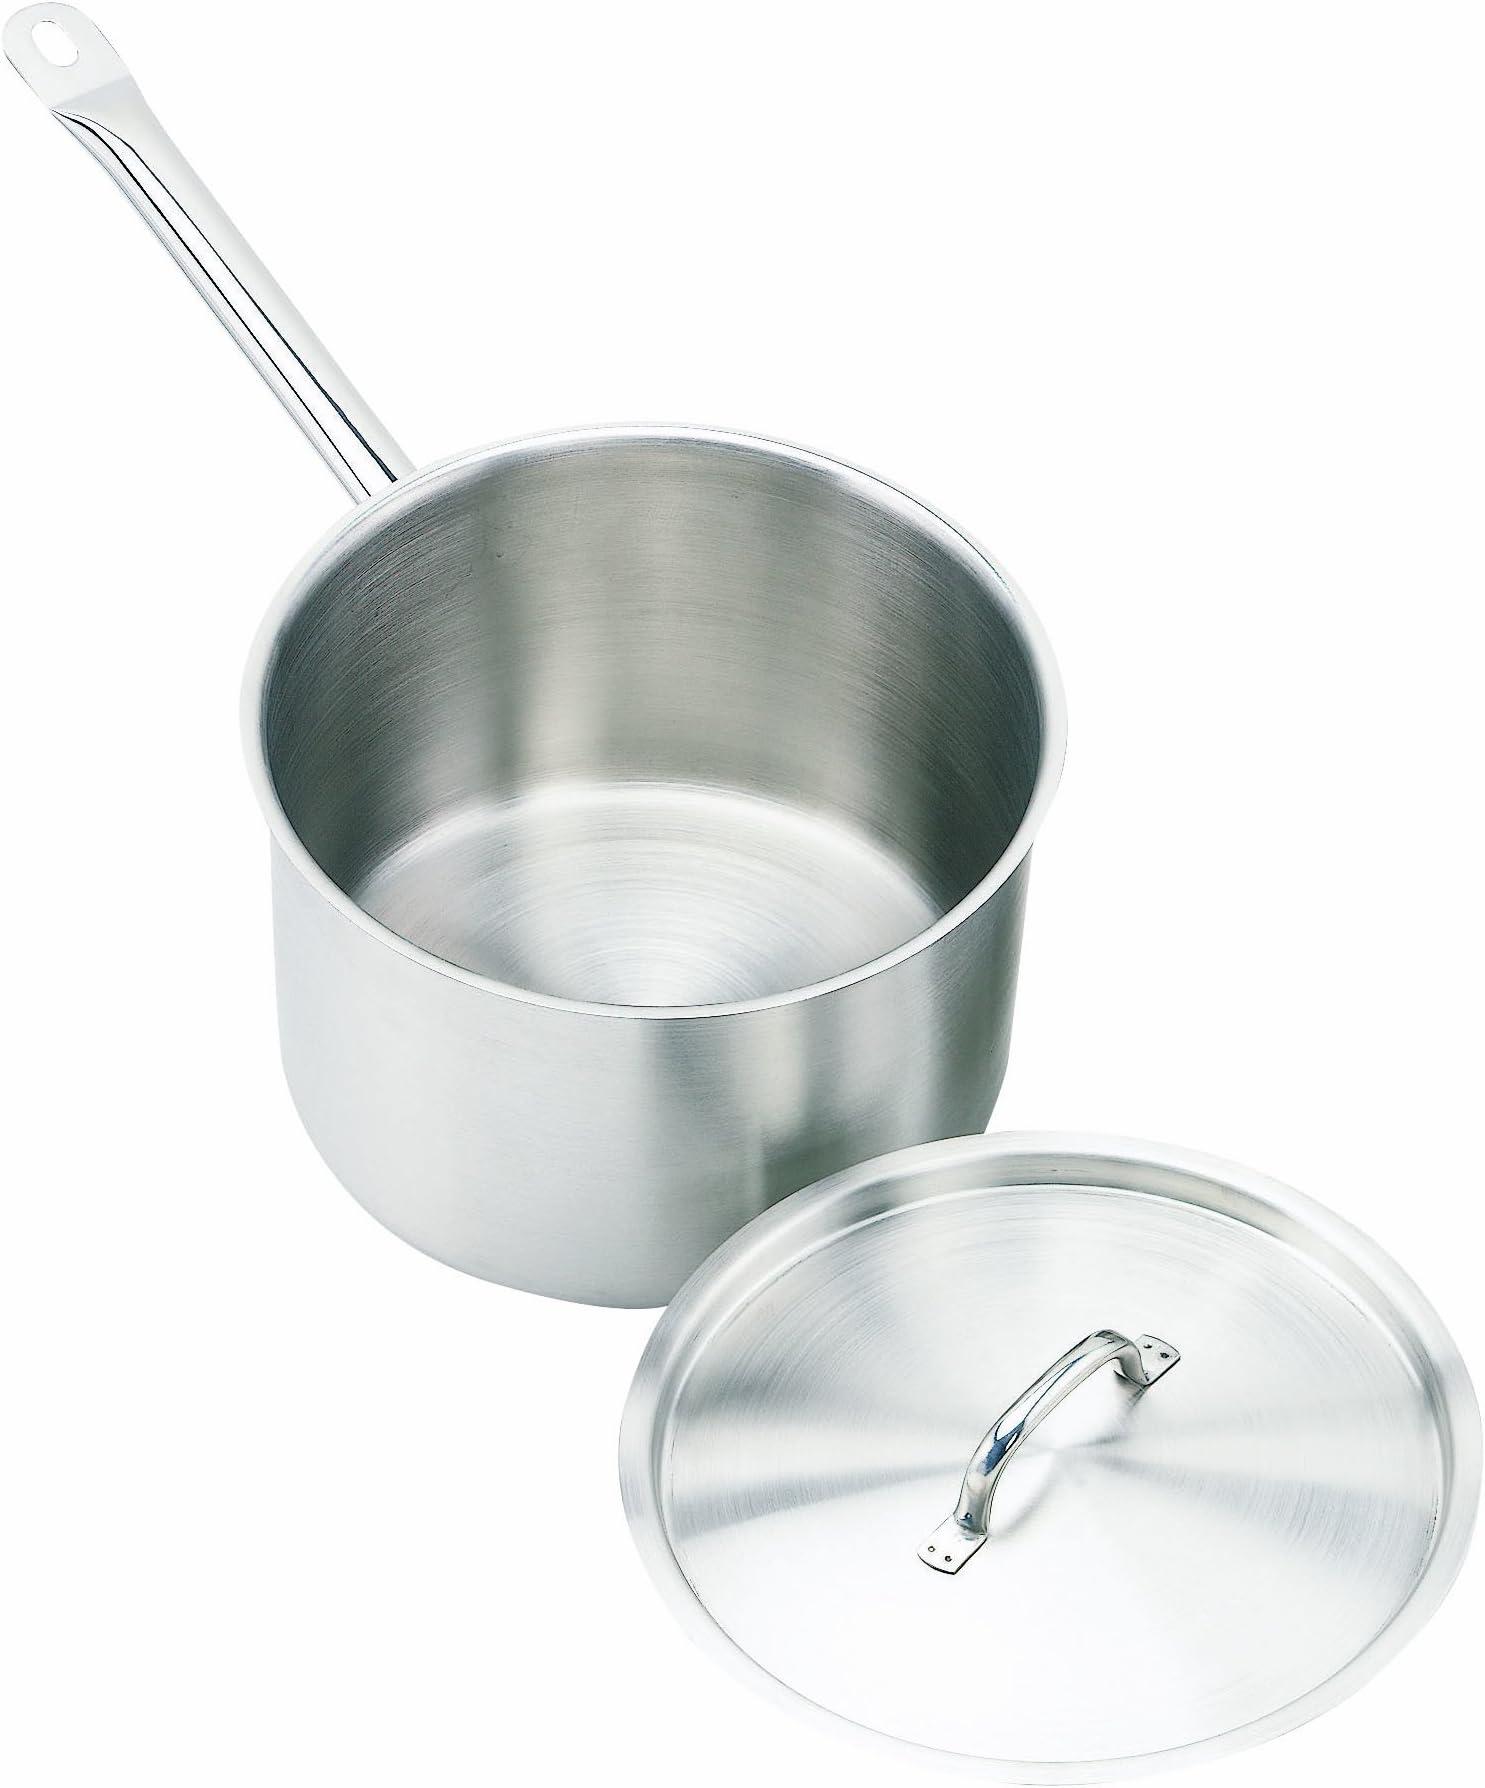 Crestware 5-Quart Stainless Steel Sauce Pan